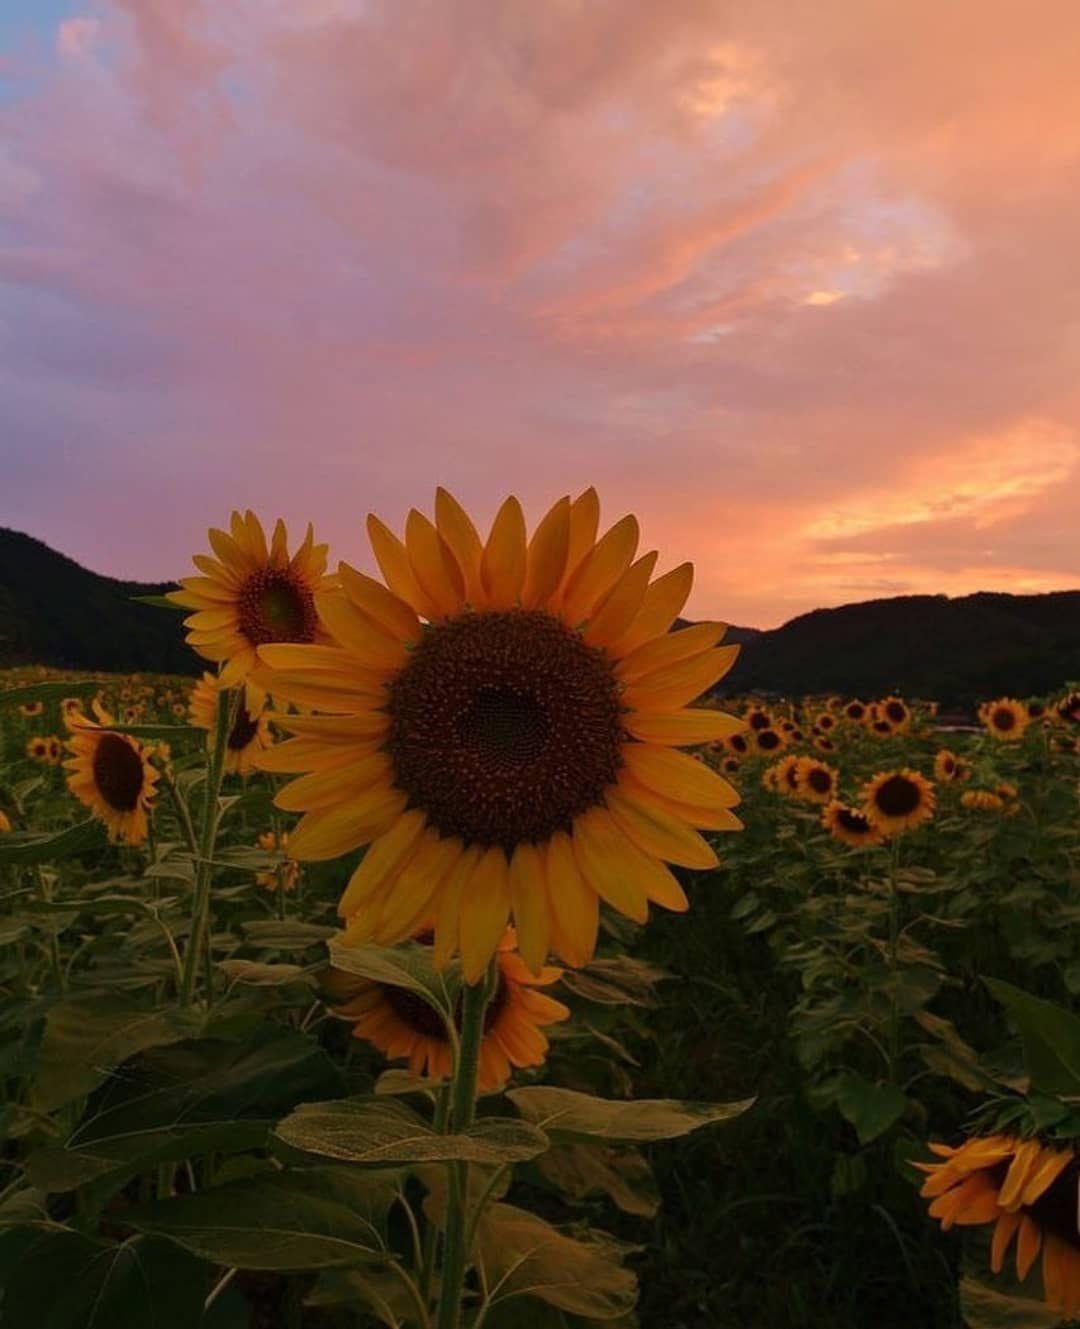 Sunflowers Sunflower Sky Sun Sunset Orange Nature Beautiful Sunshine Soulmate Vibes Aesthetic Nature Flower Background Iphone Sunflower Painting